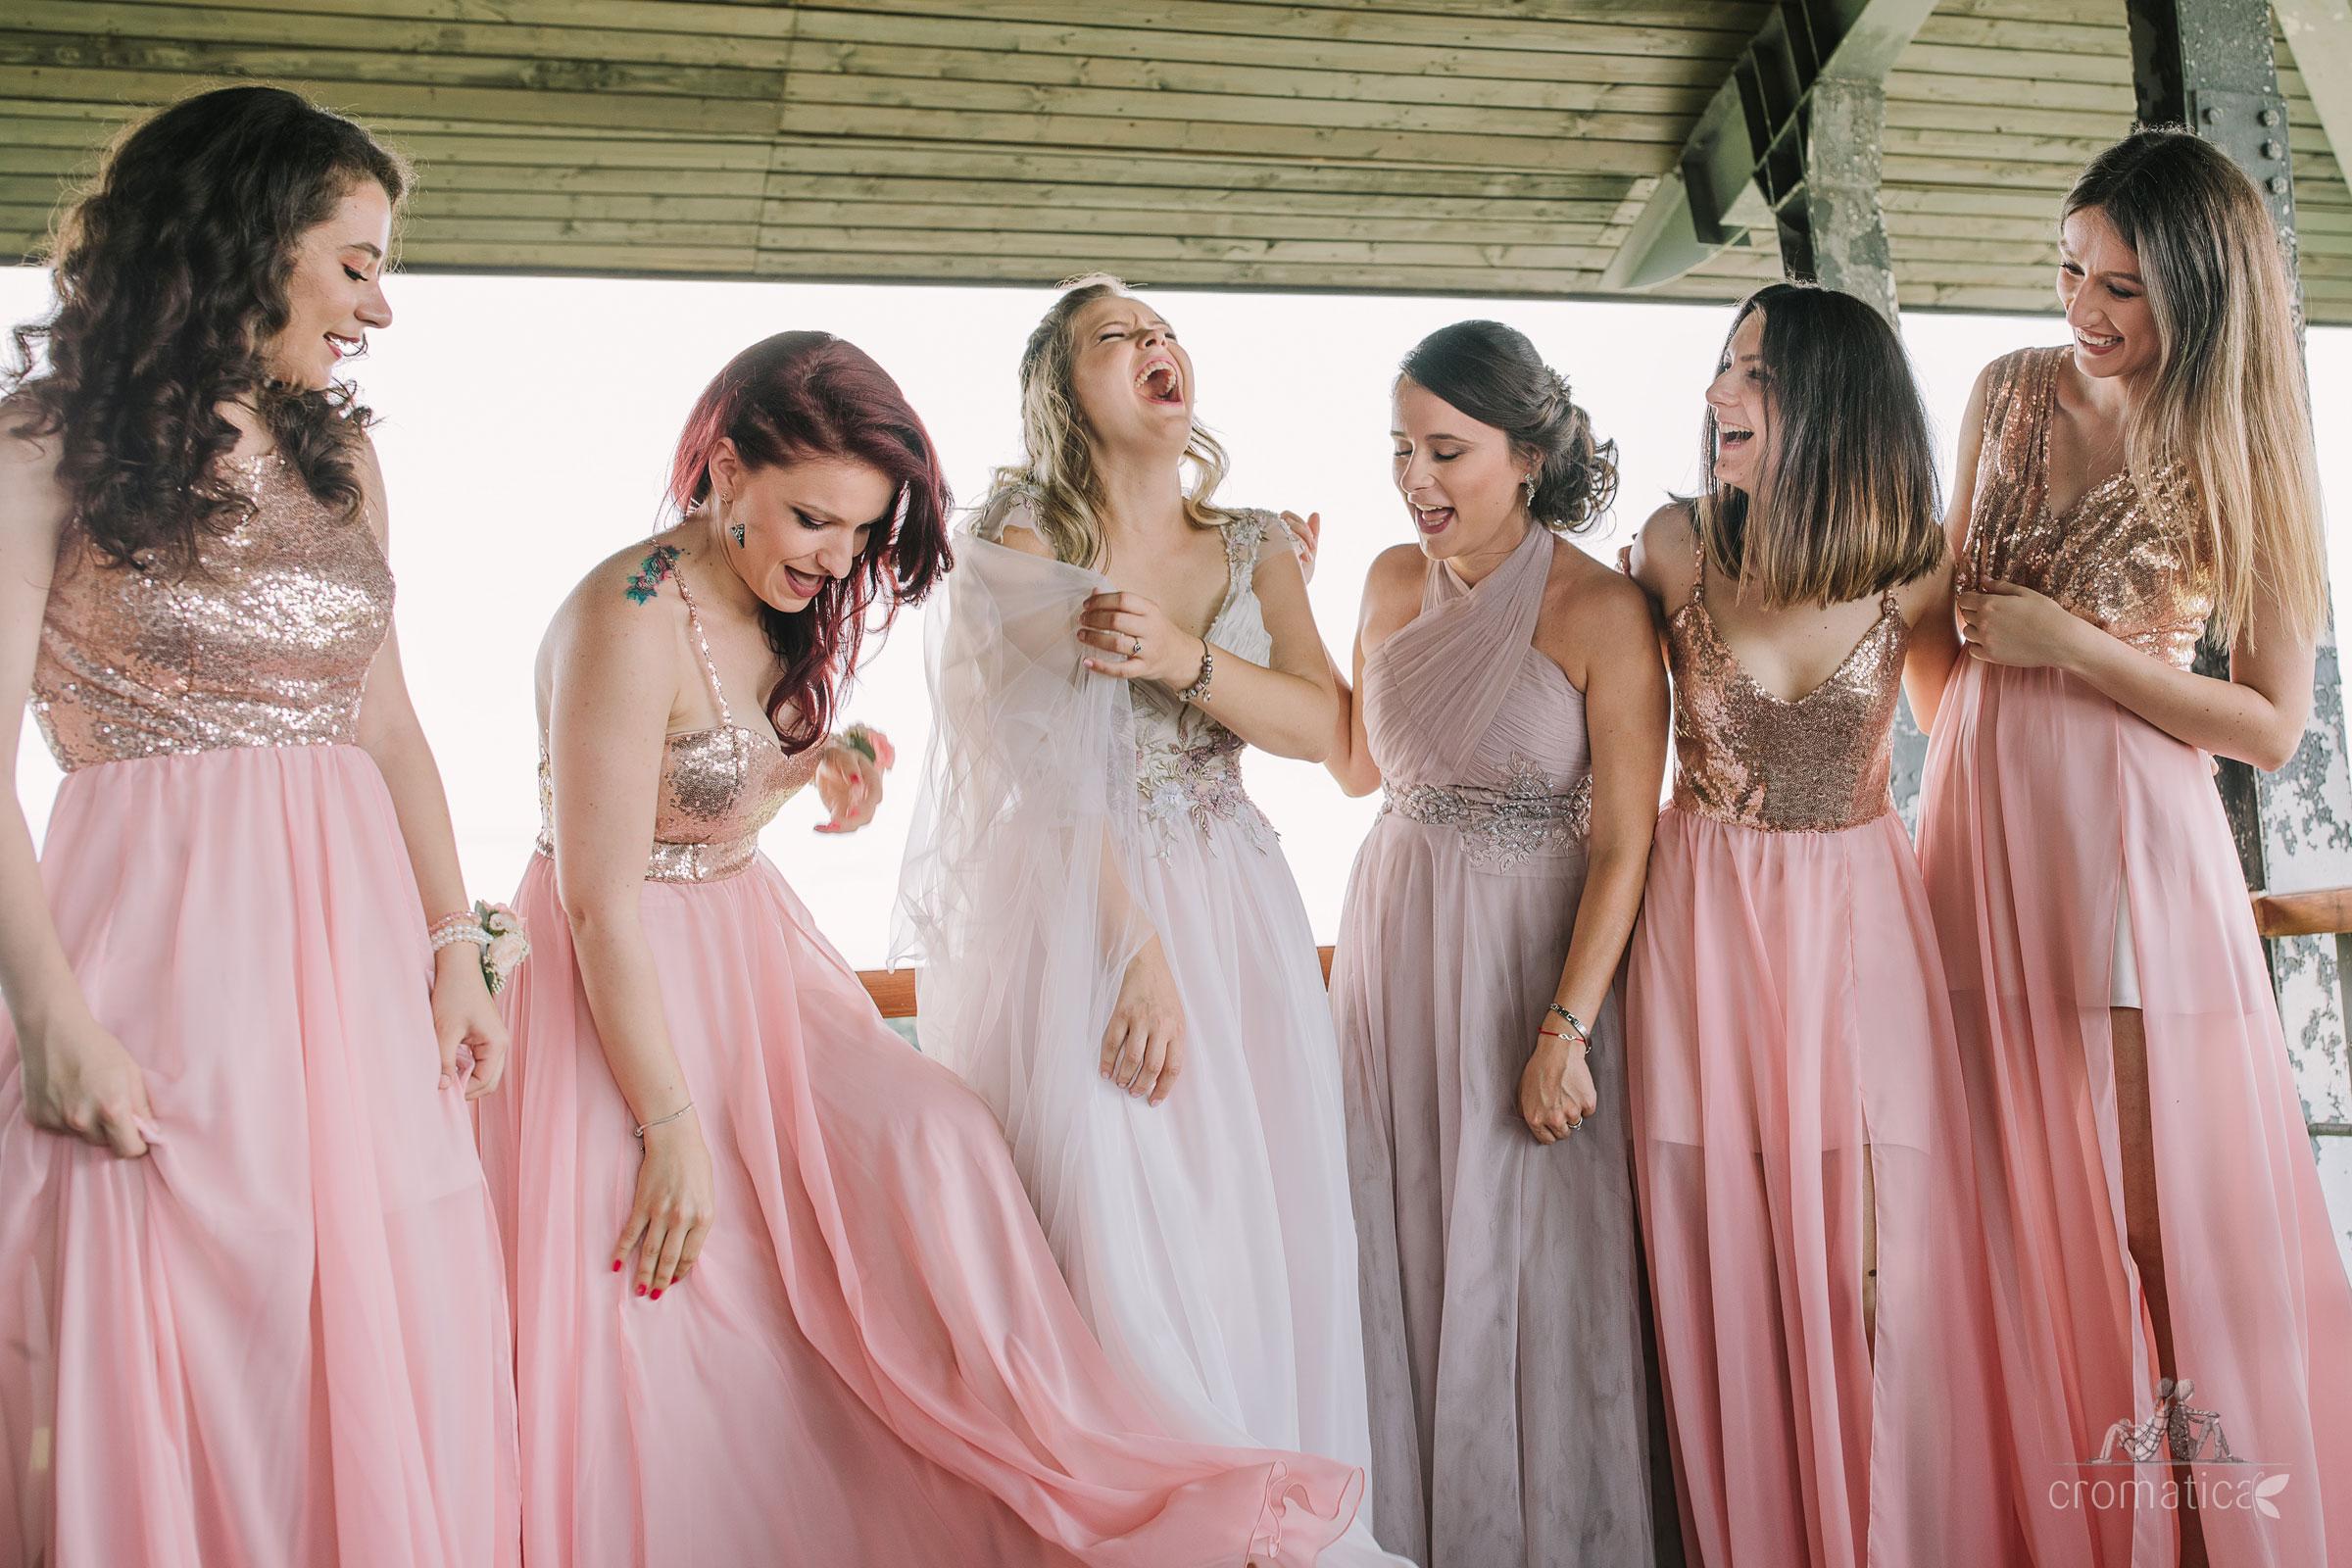 alexandra george fotografii nunta casa vlasia 029